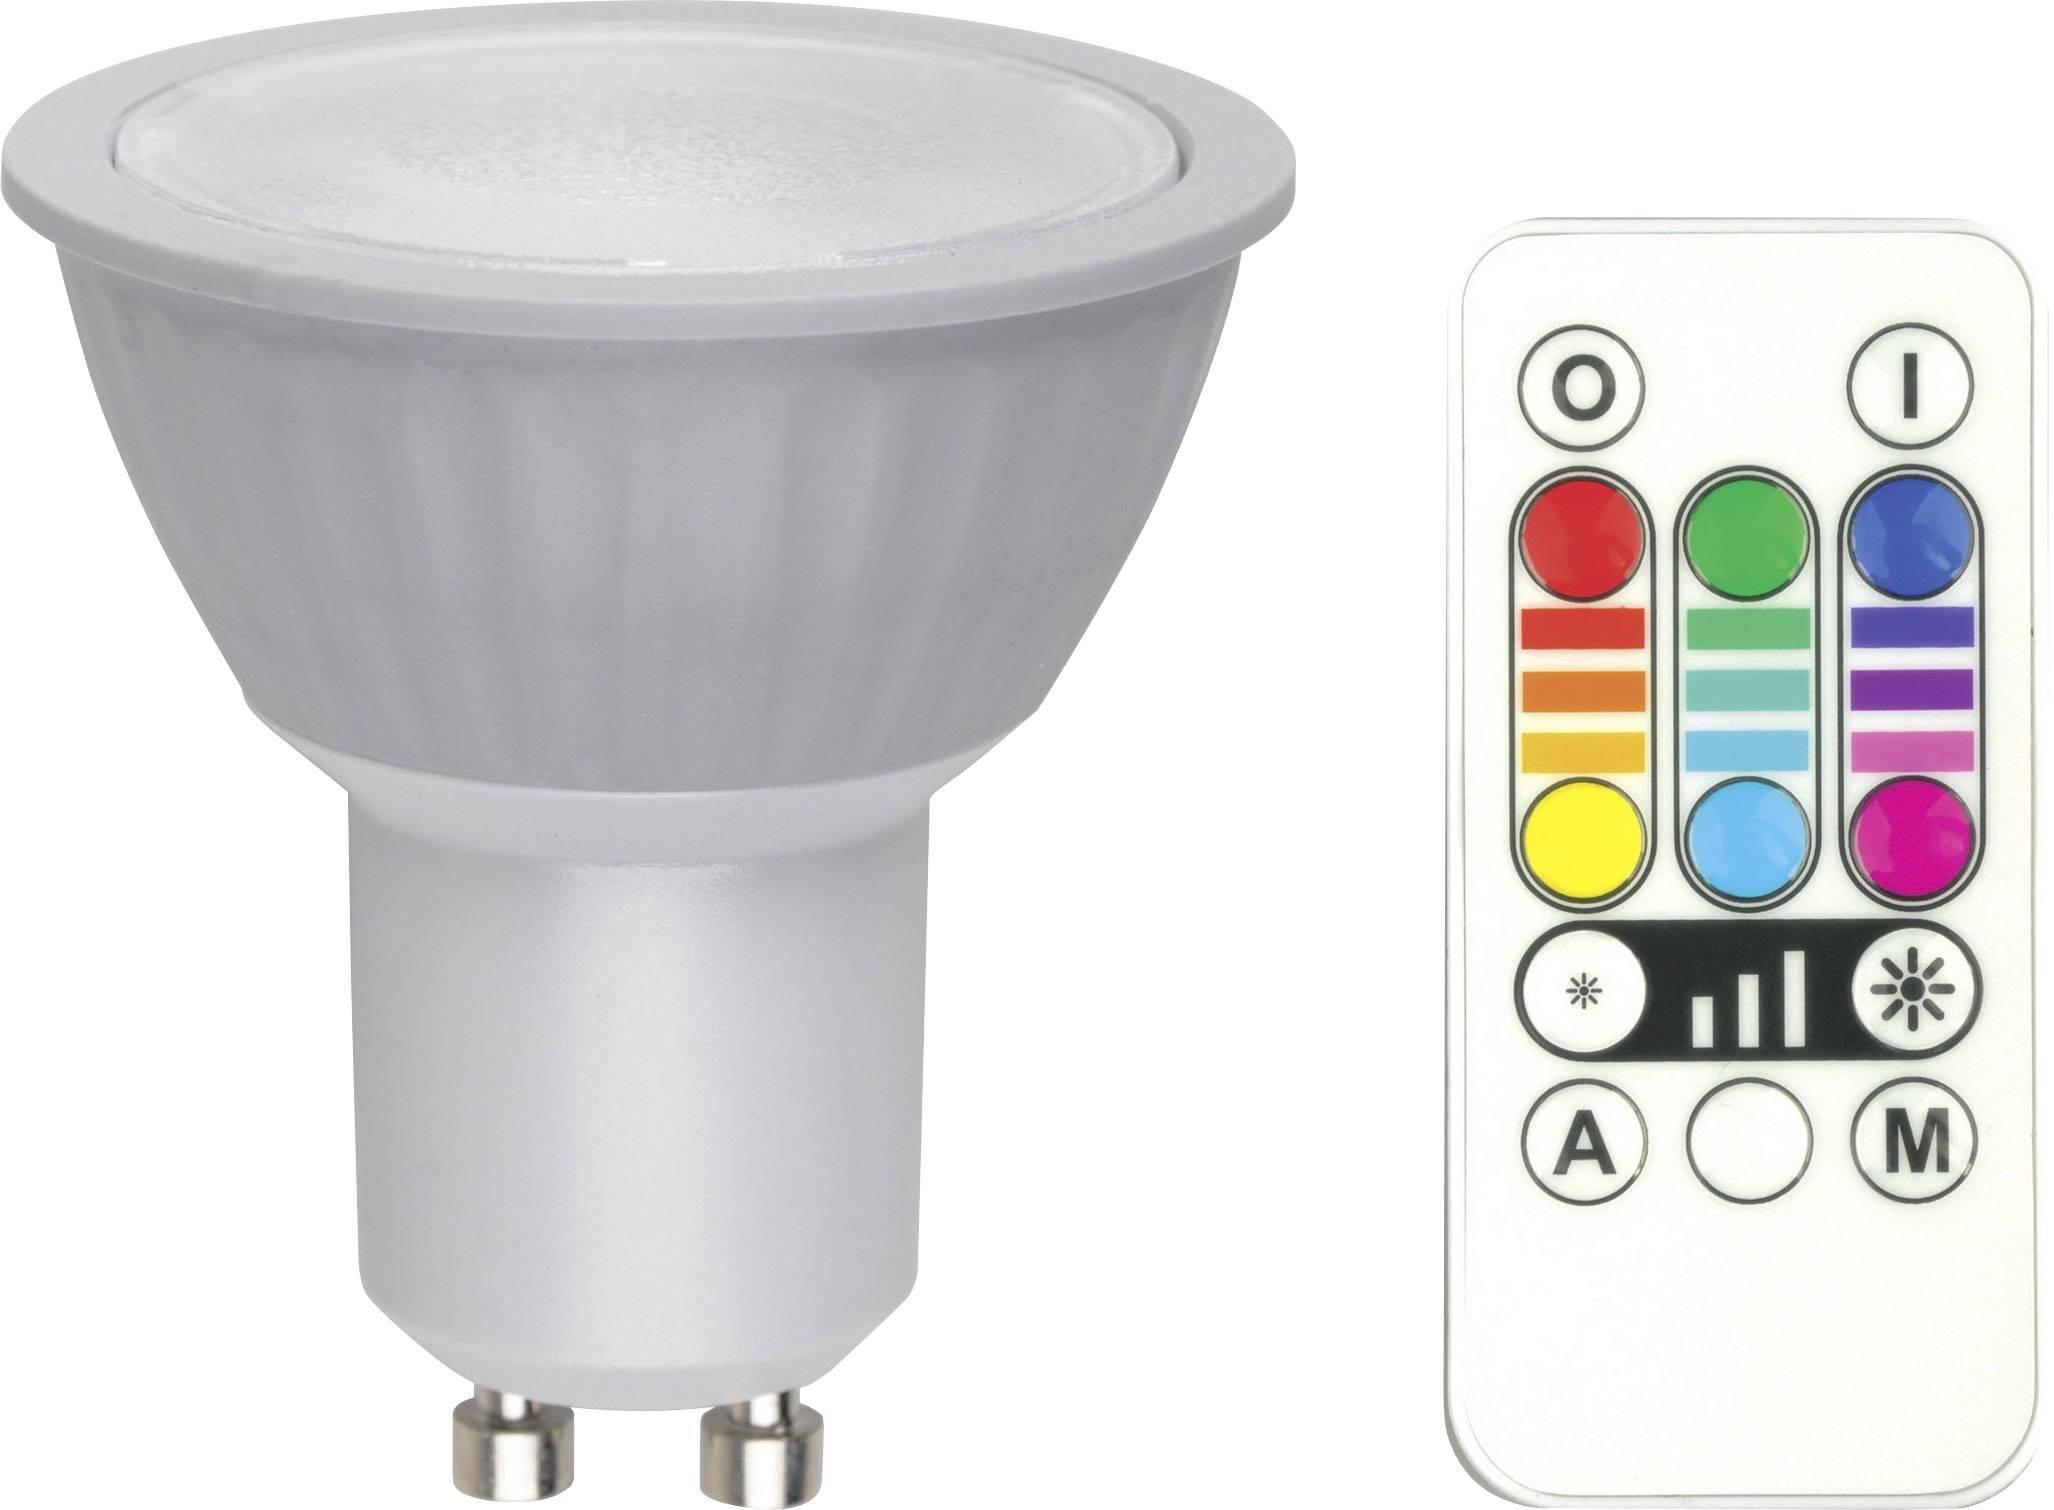 1168138 led lamp gu10 reflector 32 w 25 w rgb dimbaar colorchanging incl afstandsbediening energielabel b a